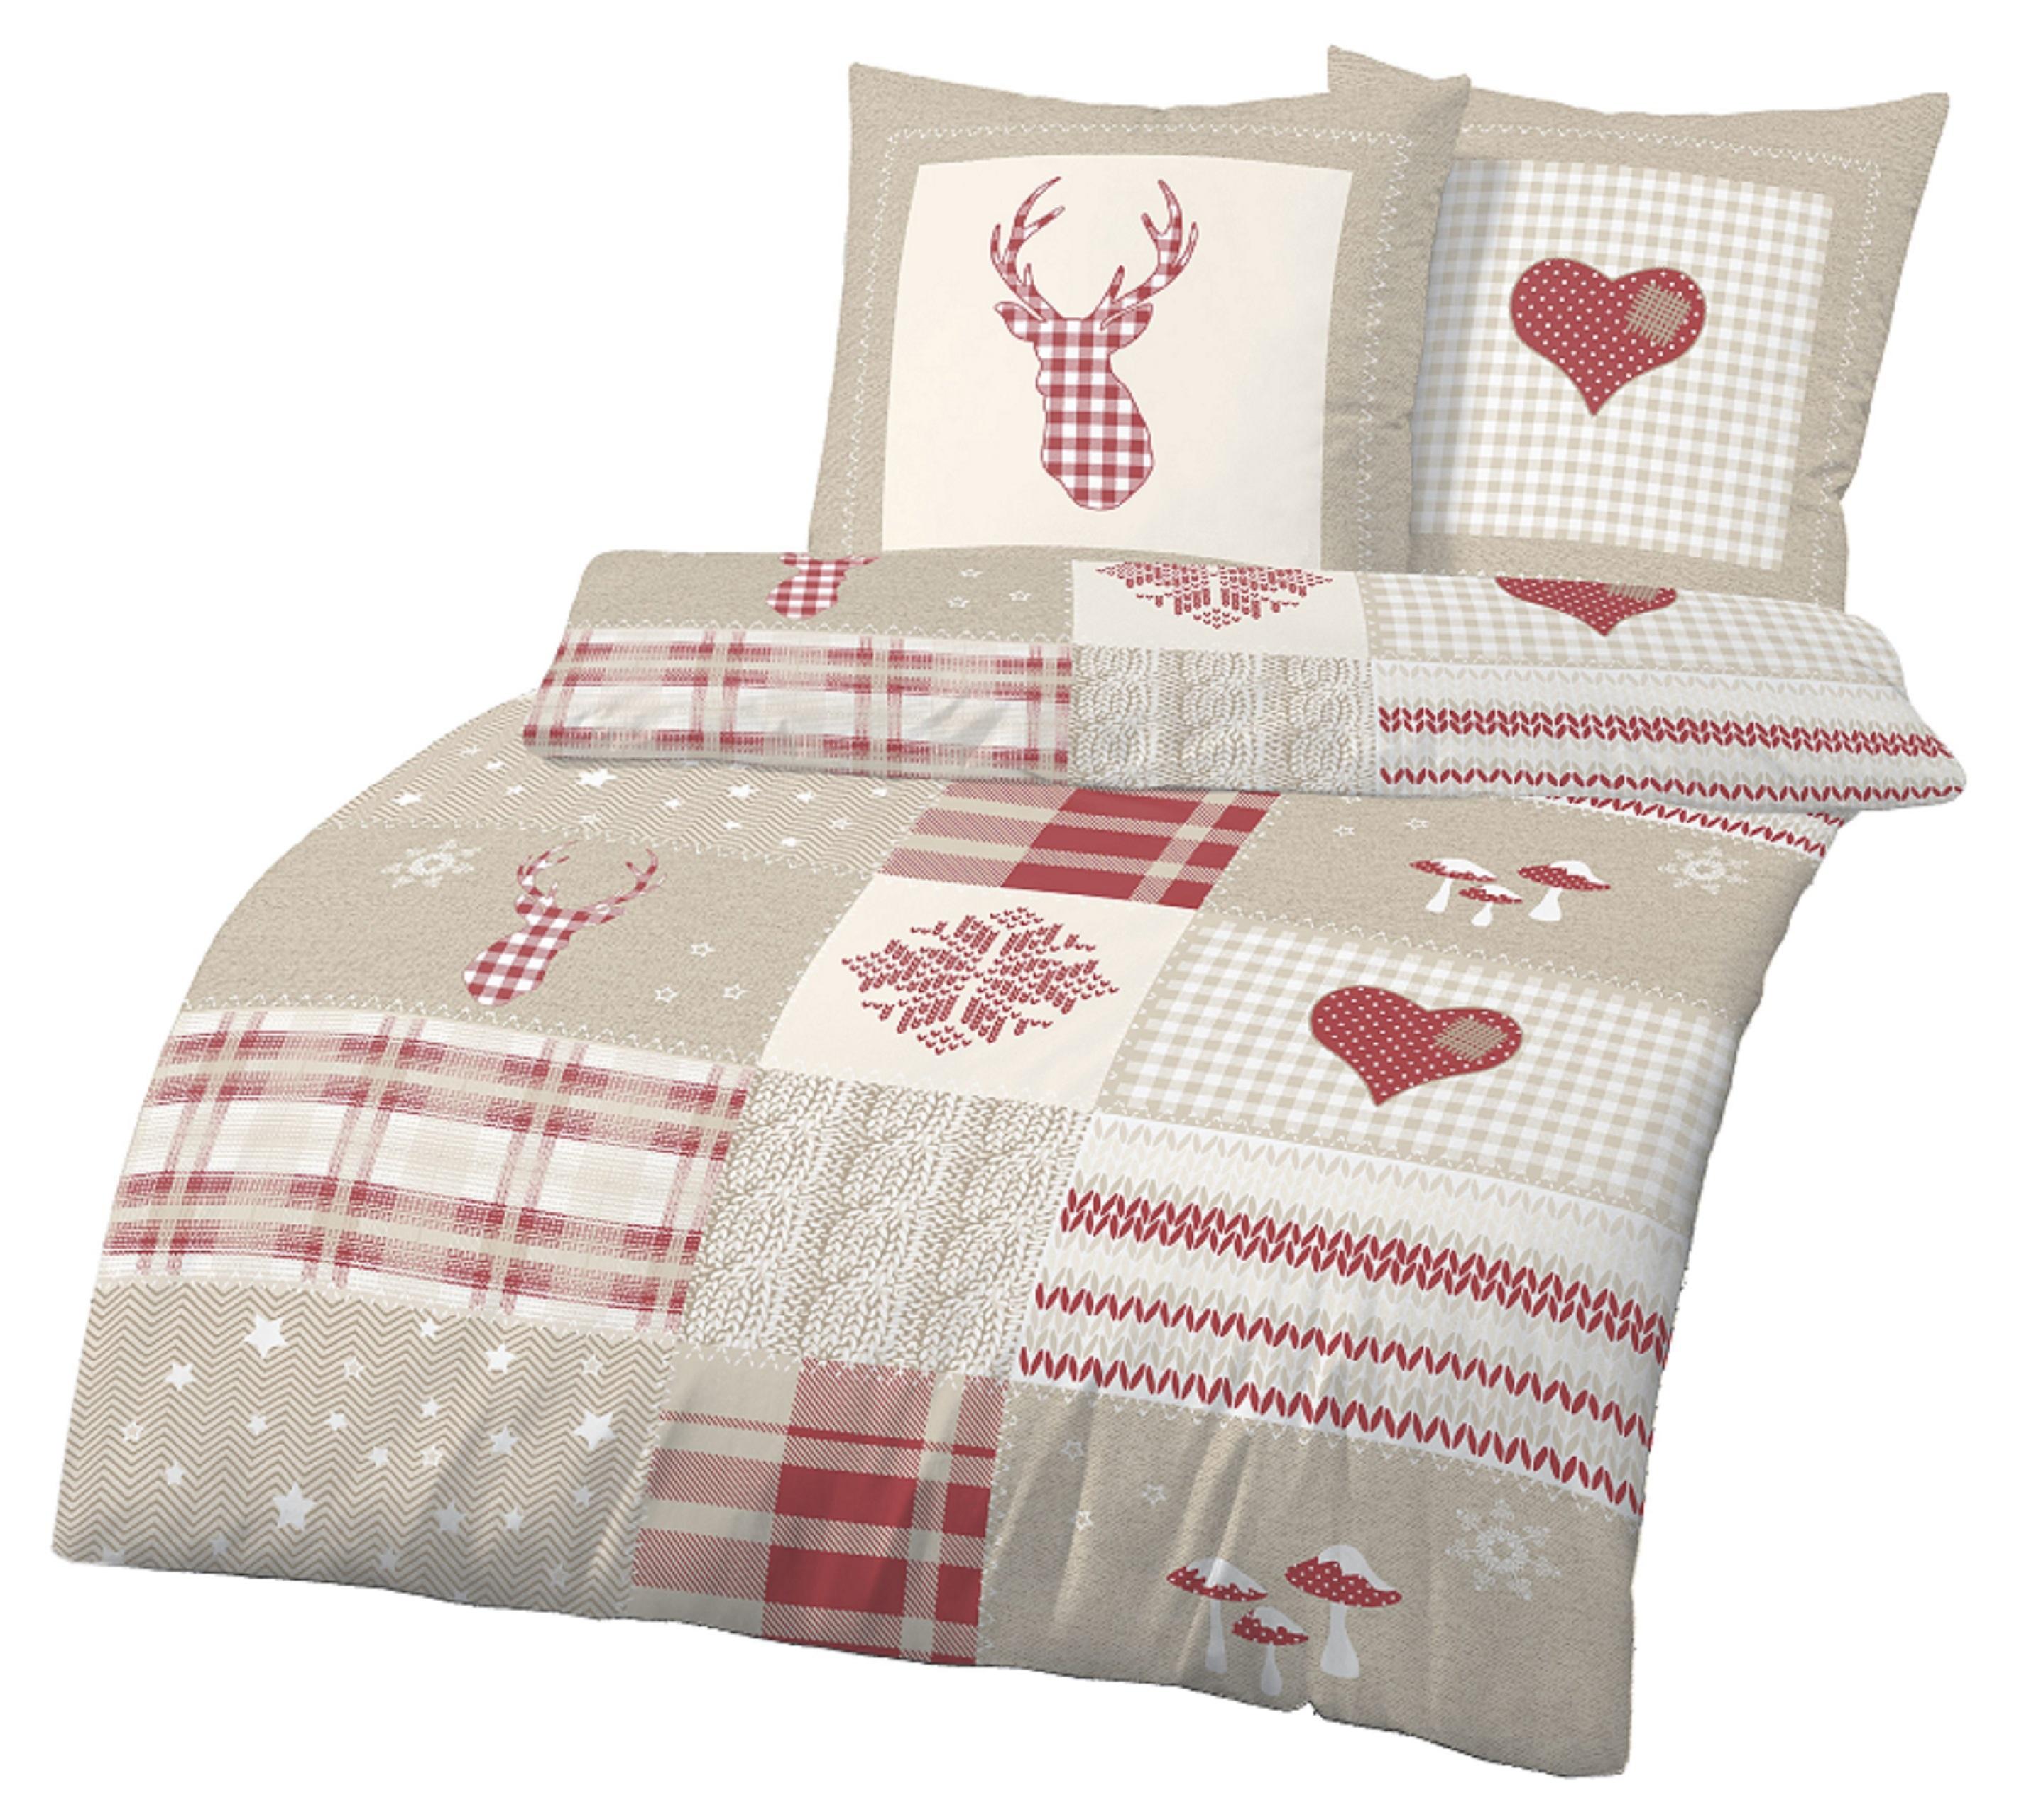 bettw sche 155x220 cm winter beige rot bergr e fein biber baumwolle b ware ebay. Black Bedroom Furniture Sets. Home Design Ideas